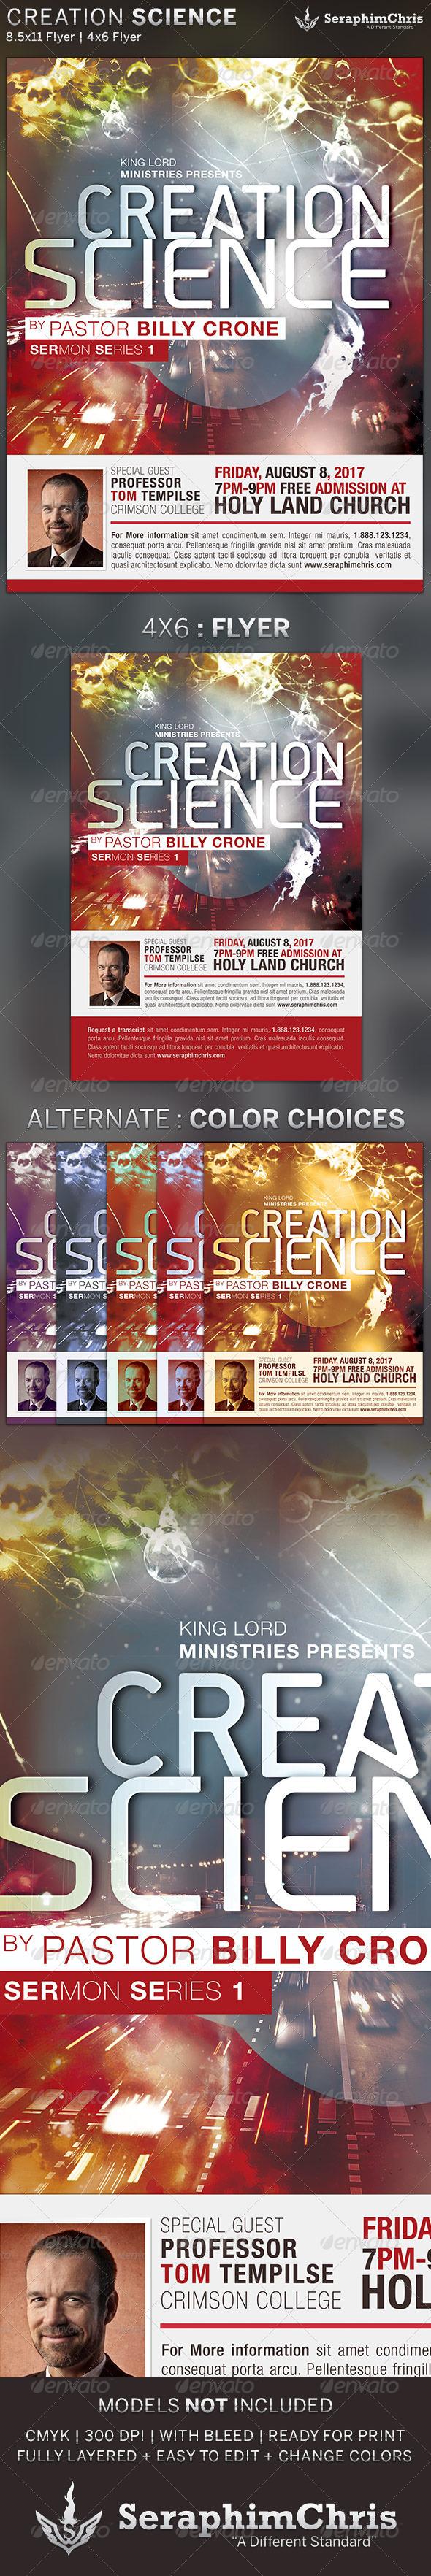 Creation Science: Church Flyer Template - Church Flyers